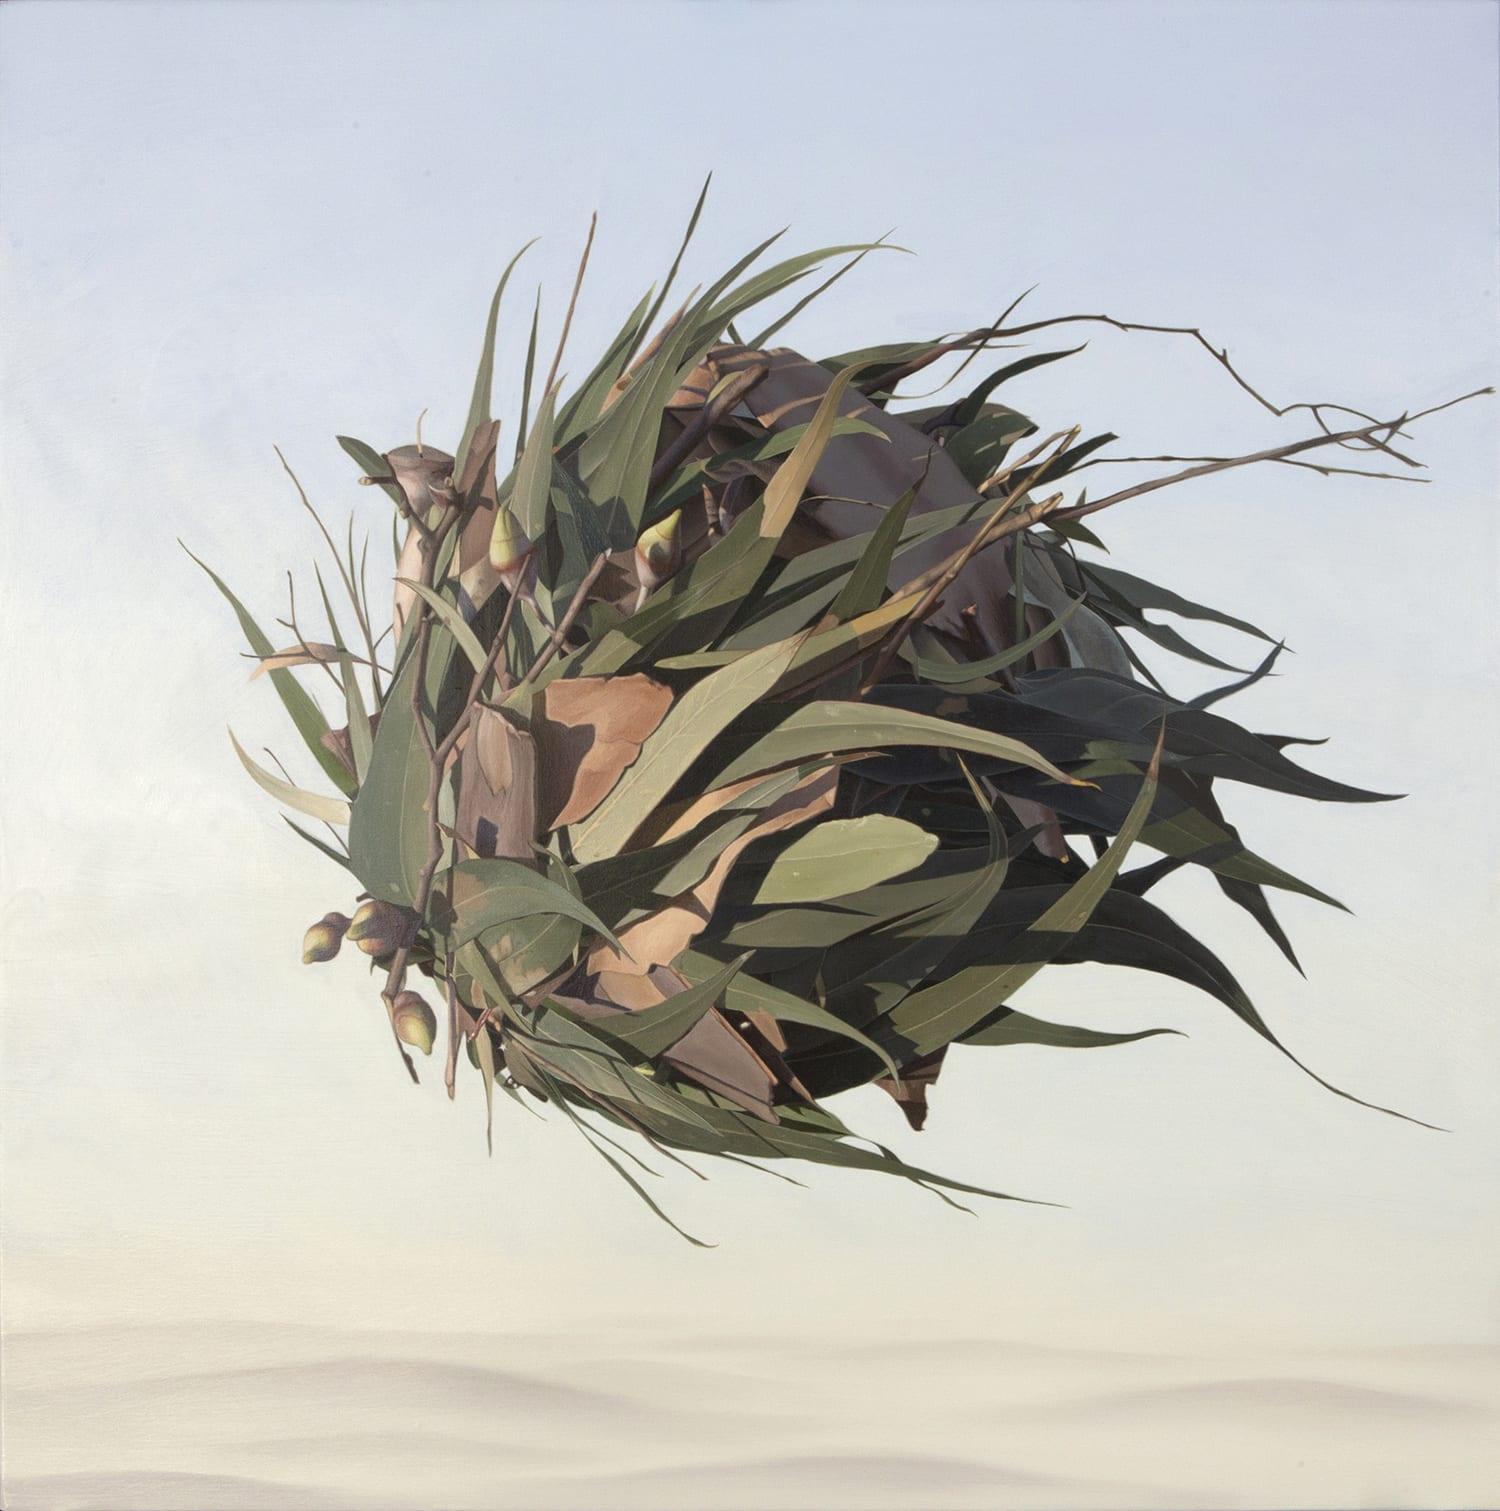 Juan Ford, Leaf Ball, 2018